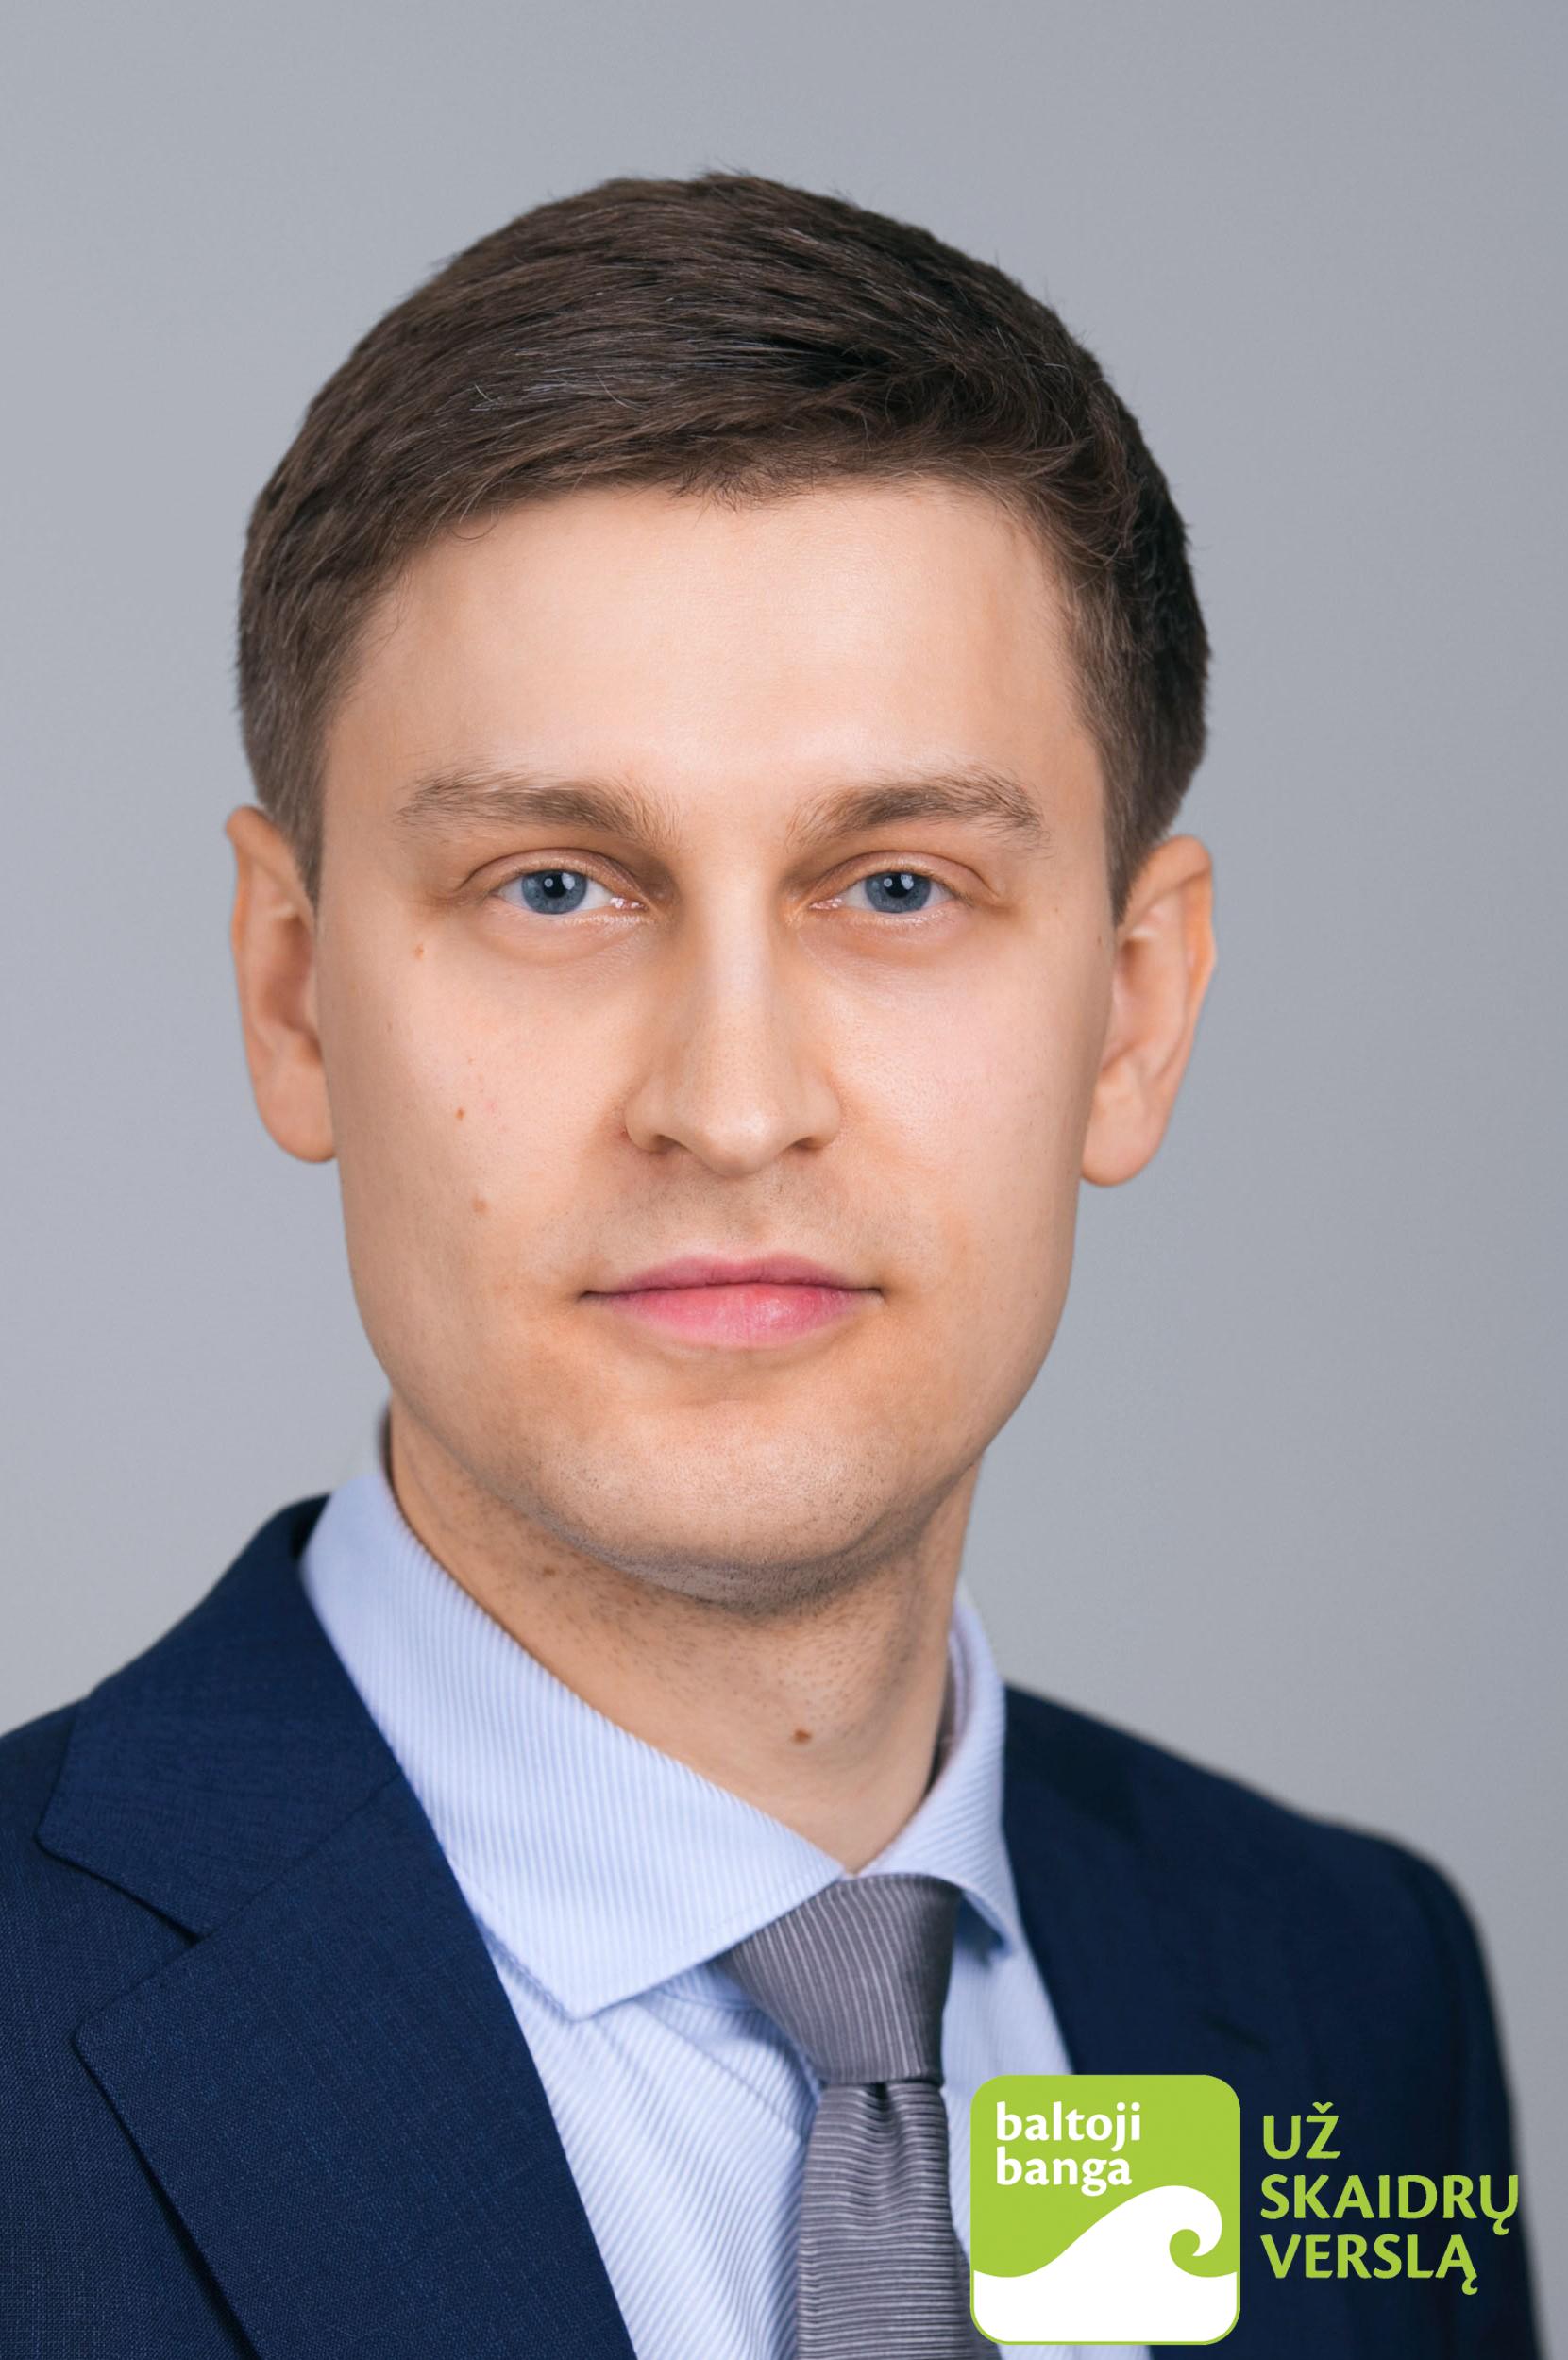 Julius Seskauskas sm